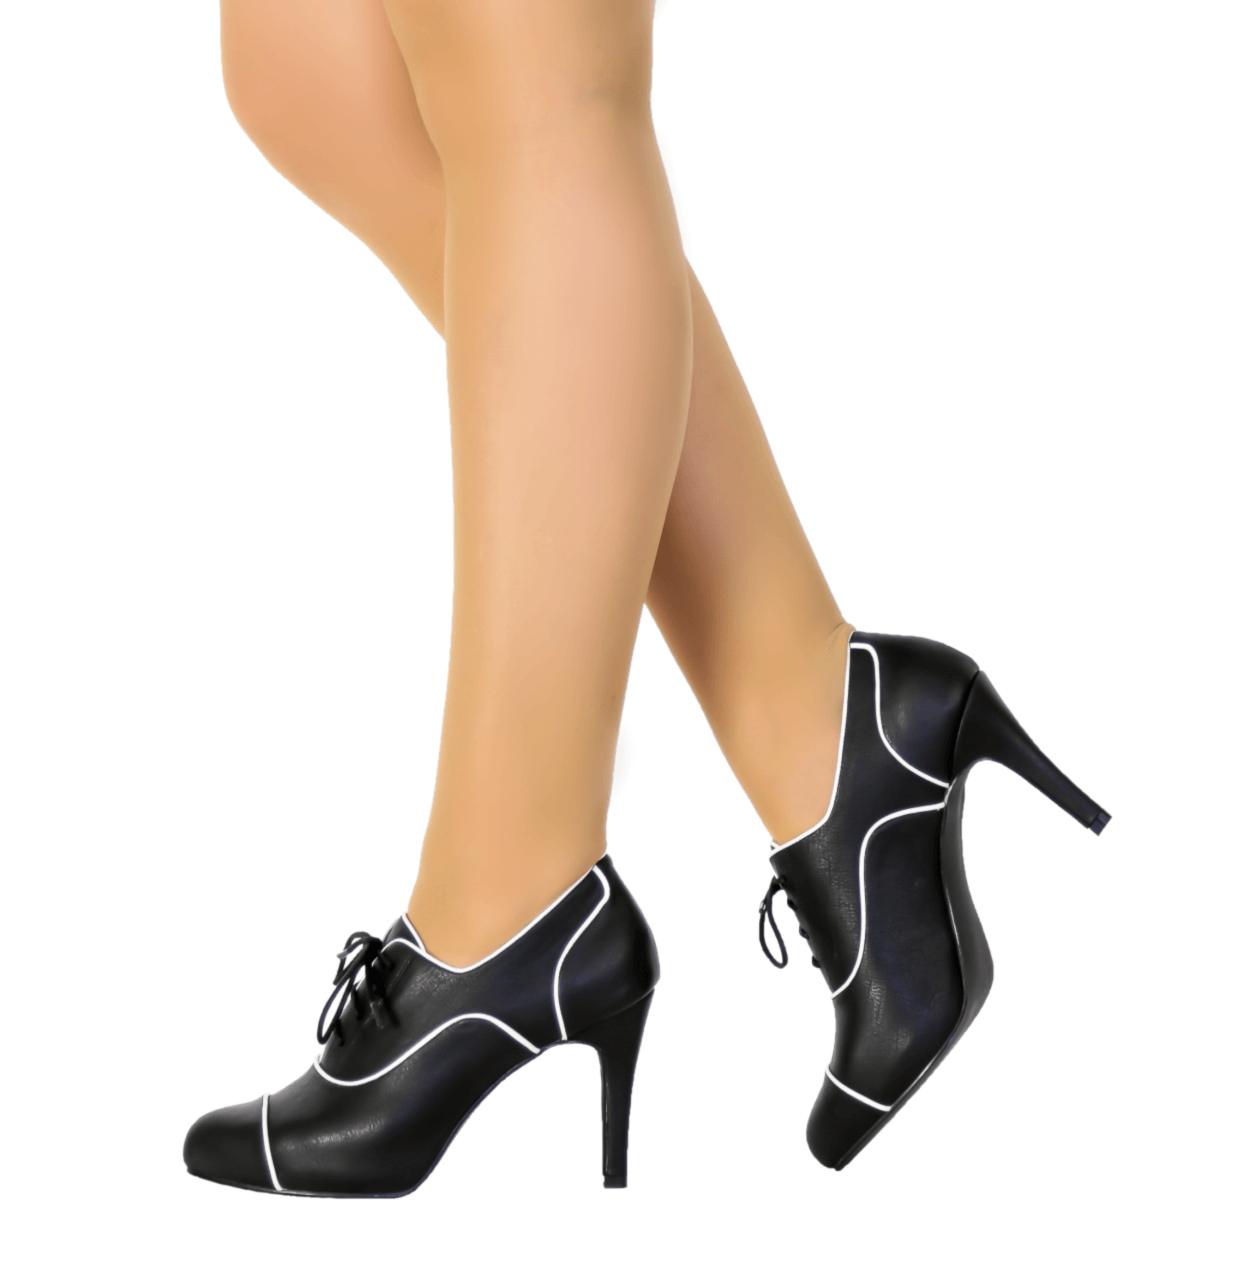 Black & White Mid Heel Bootie I Baxter by Scarlettos